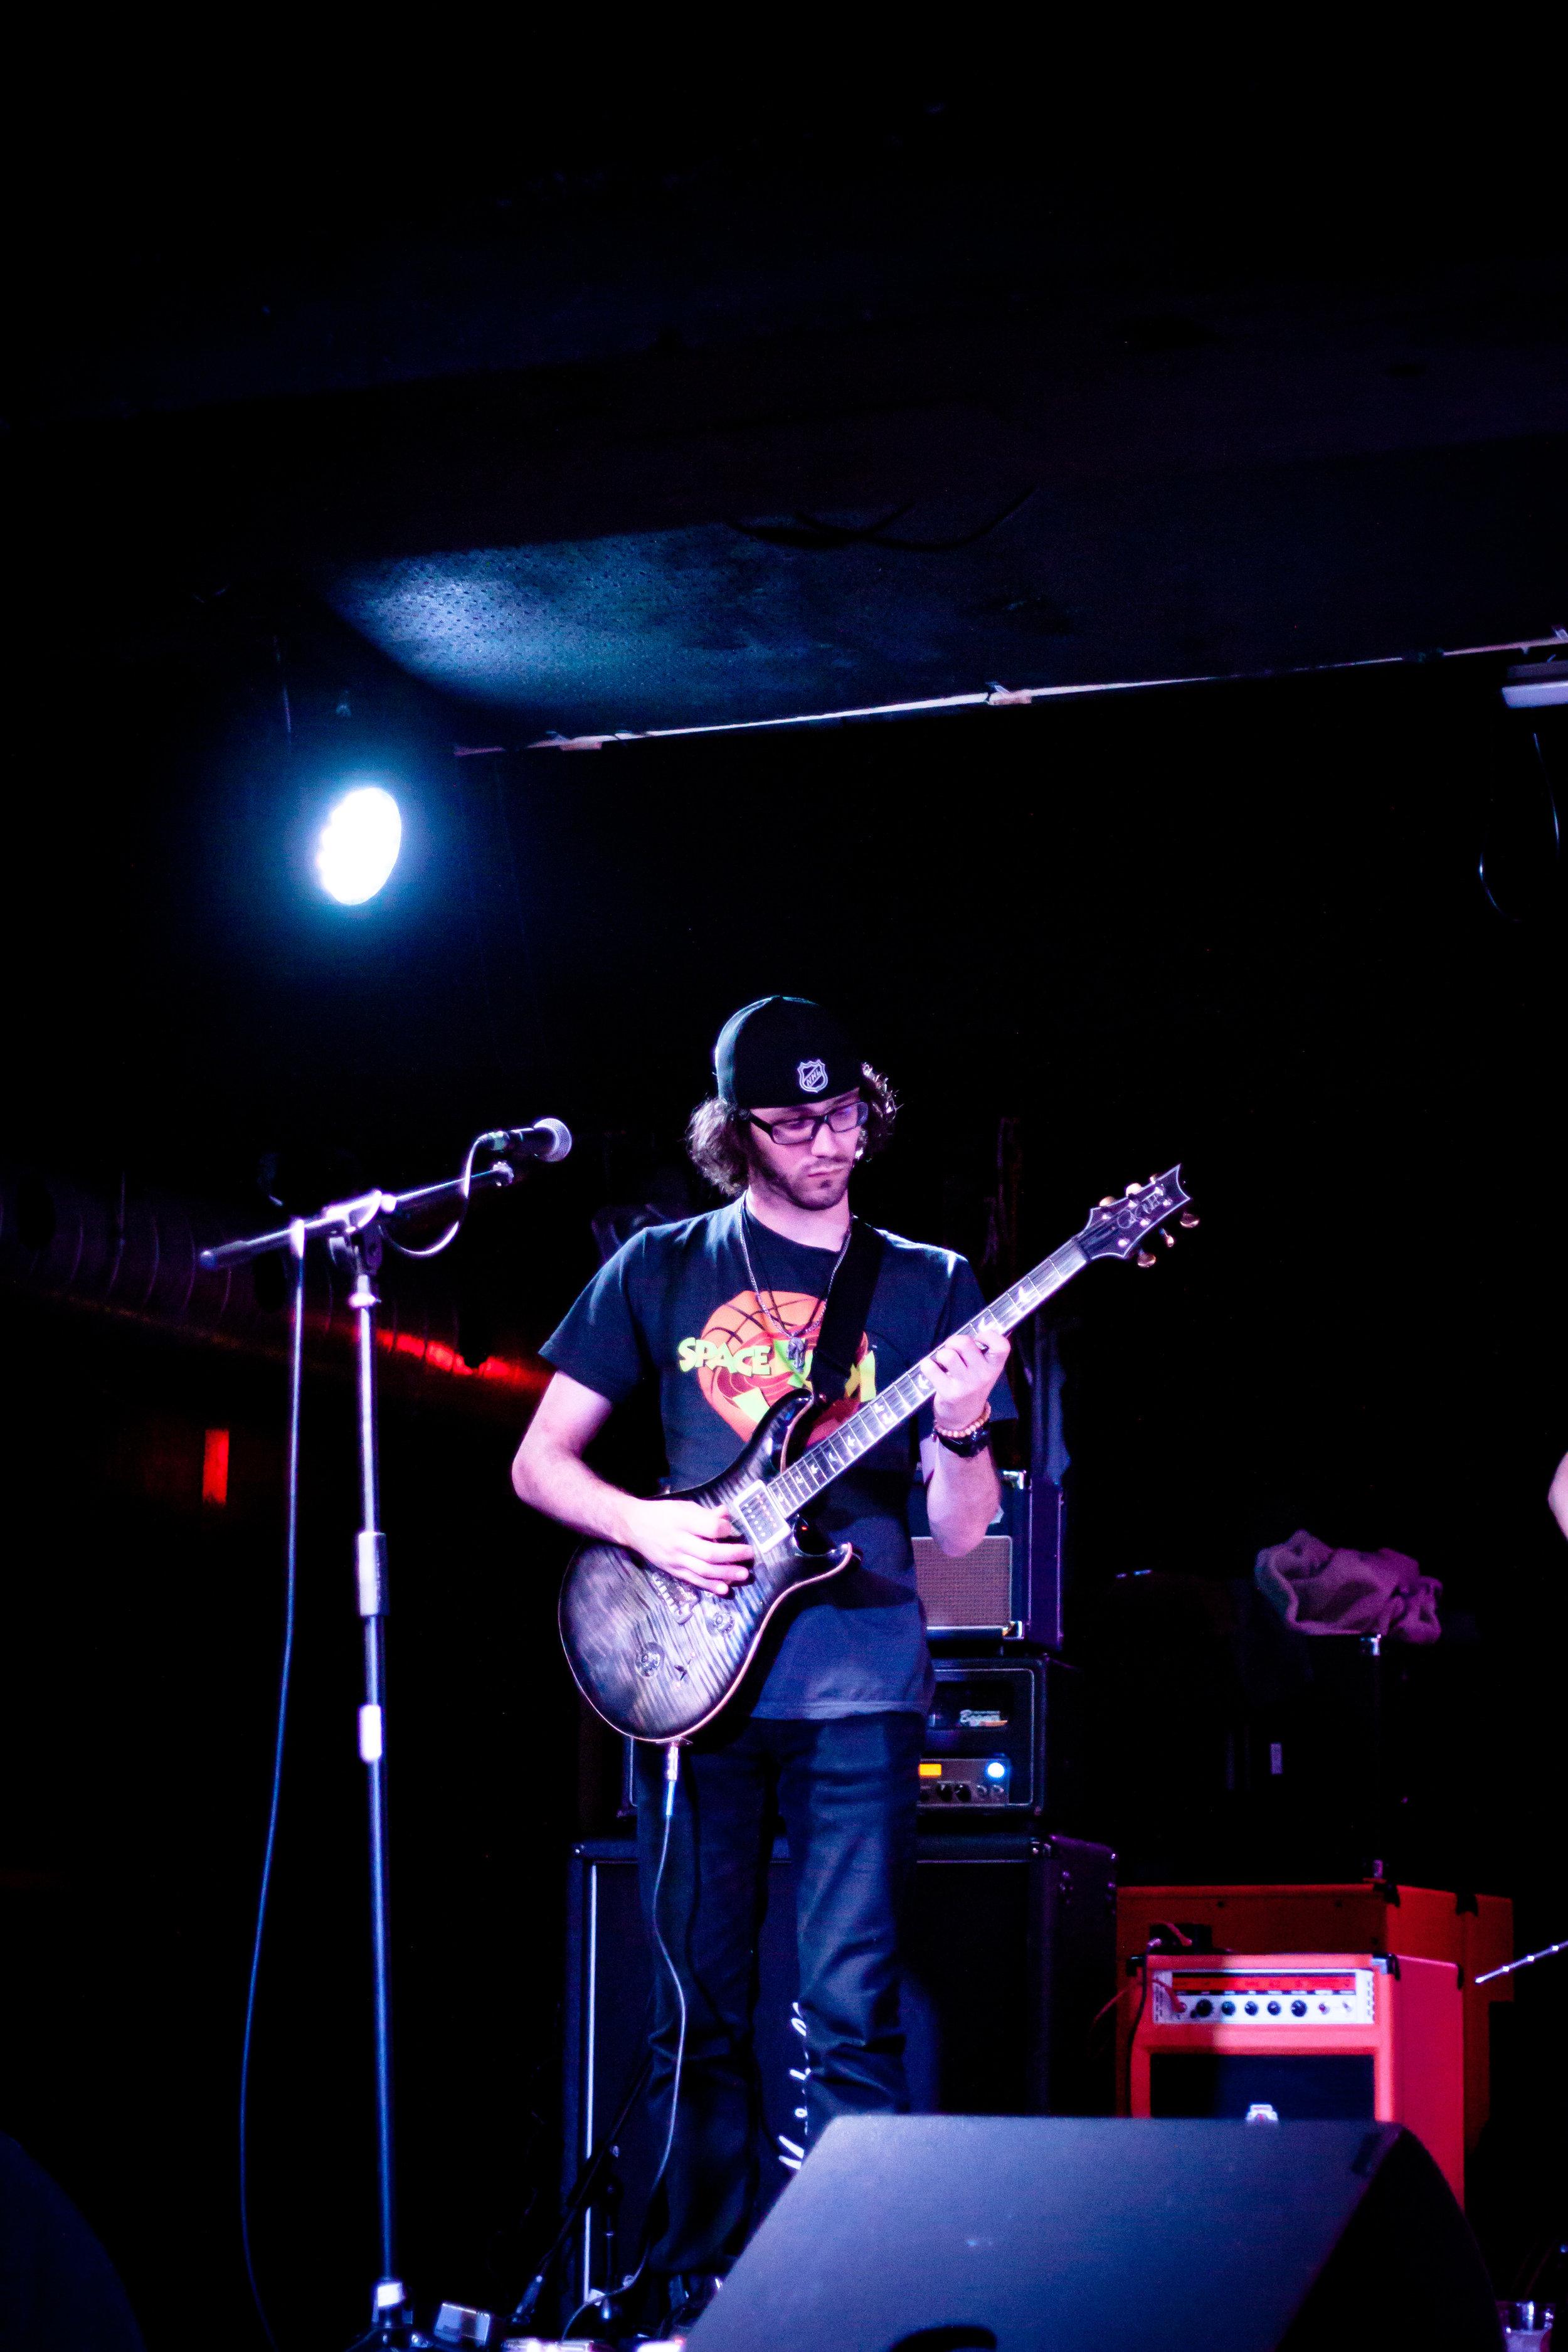 Montreal Photo 3 - Full Band.jpg.jpg